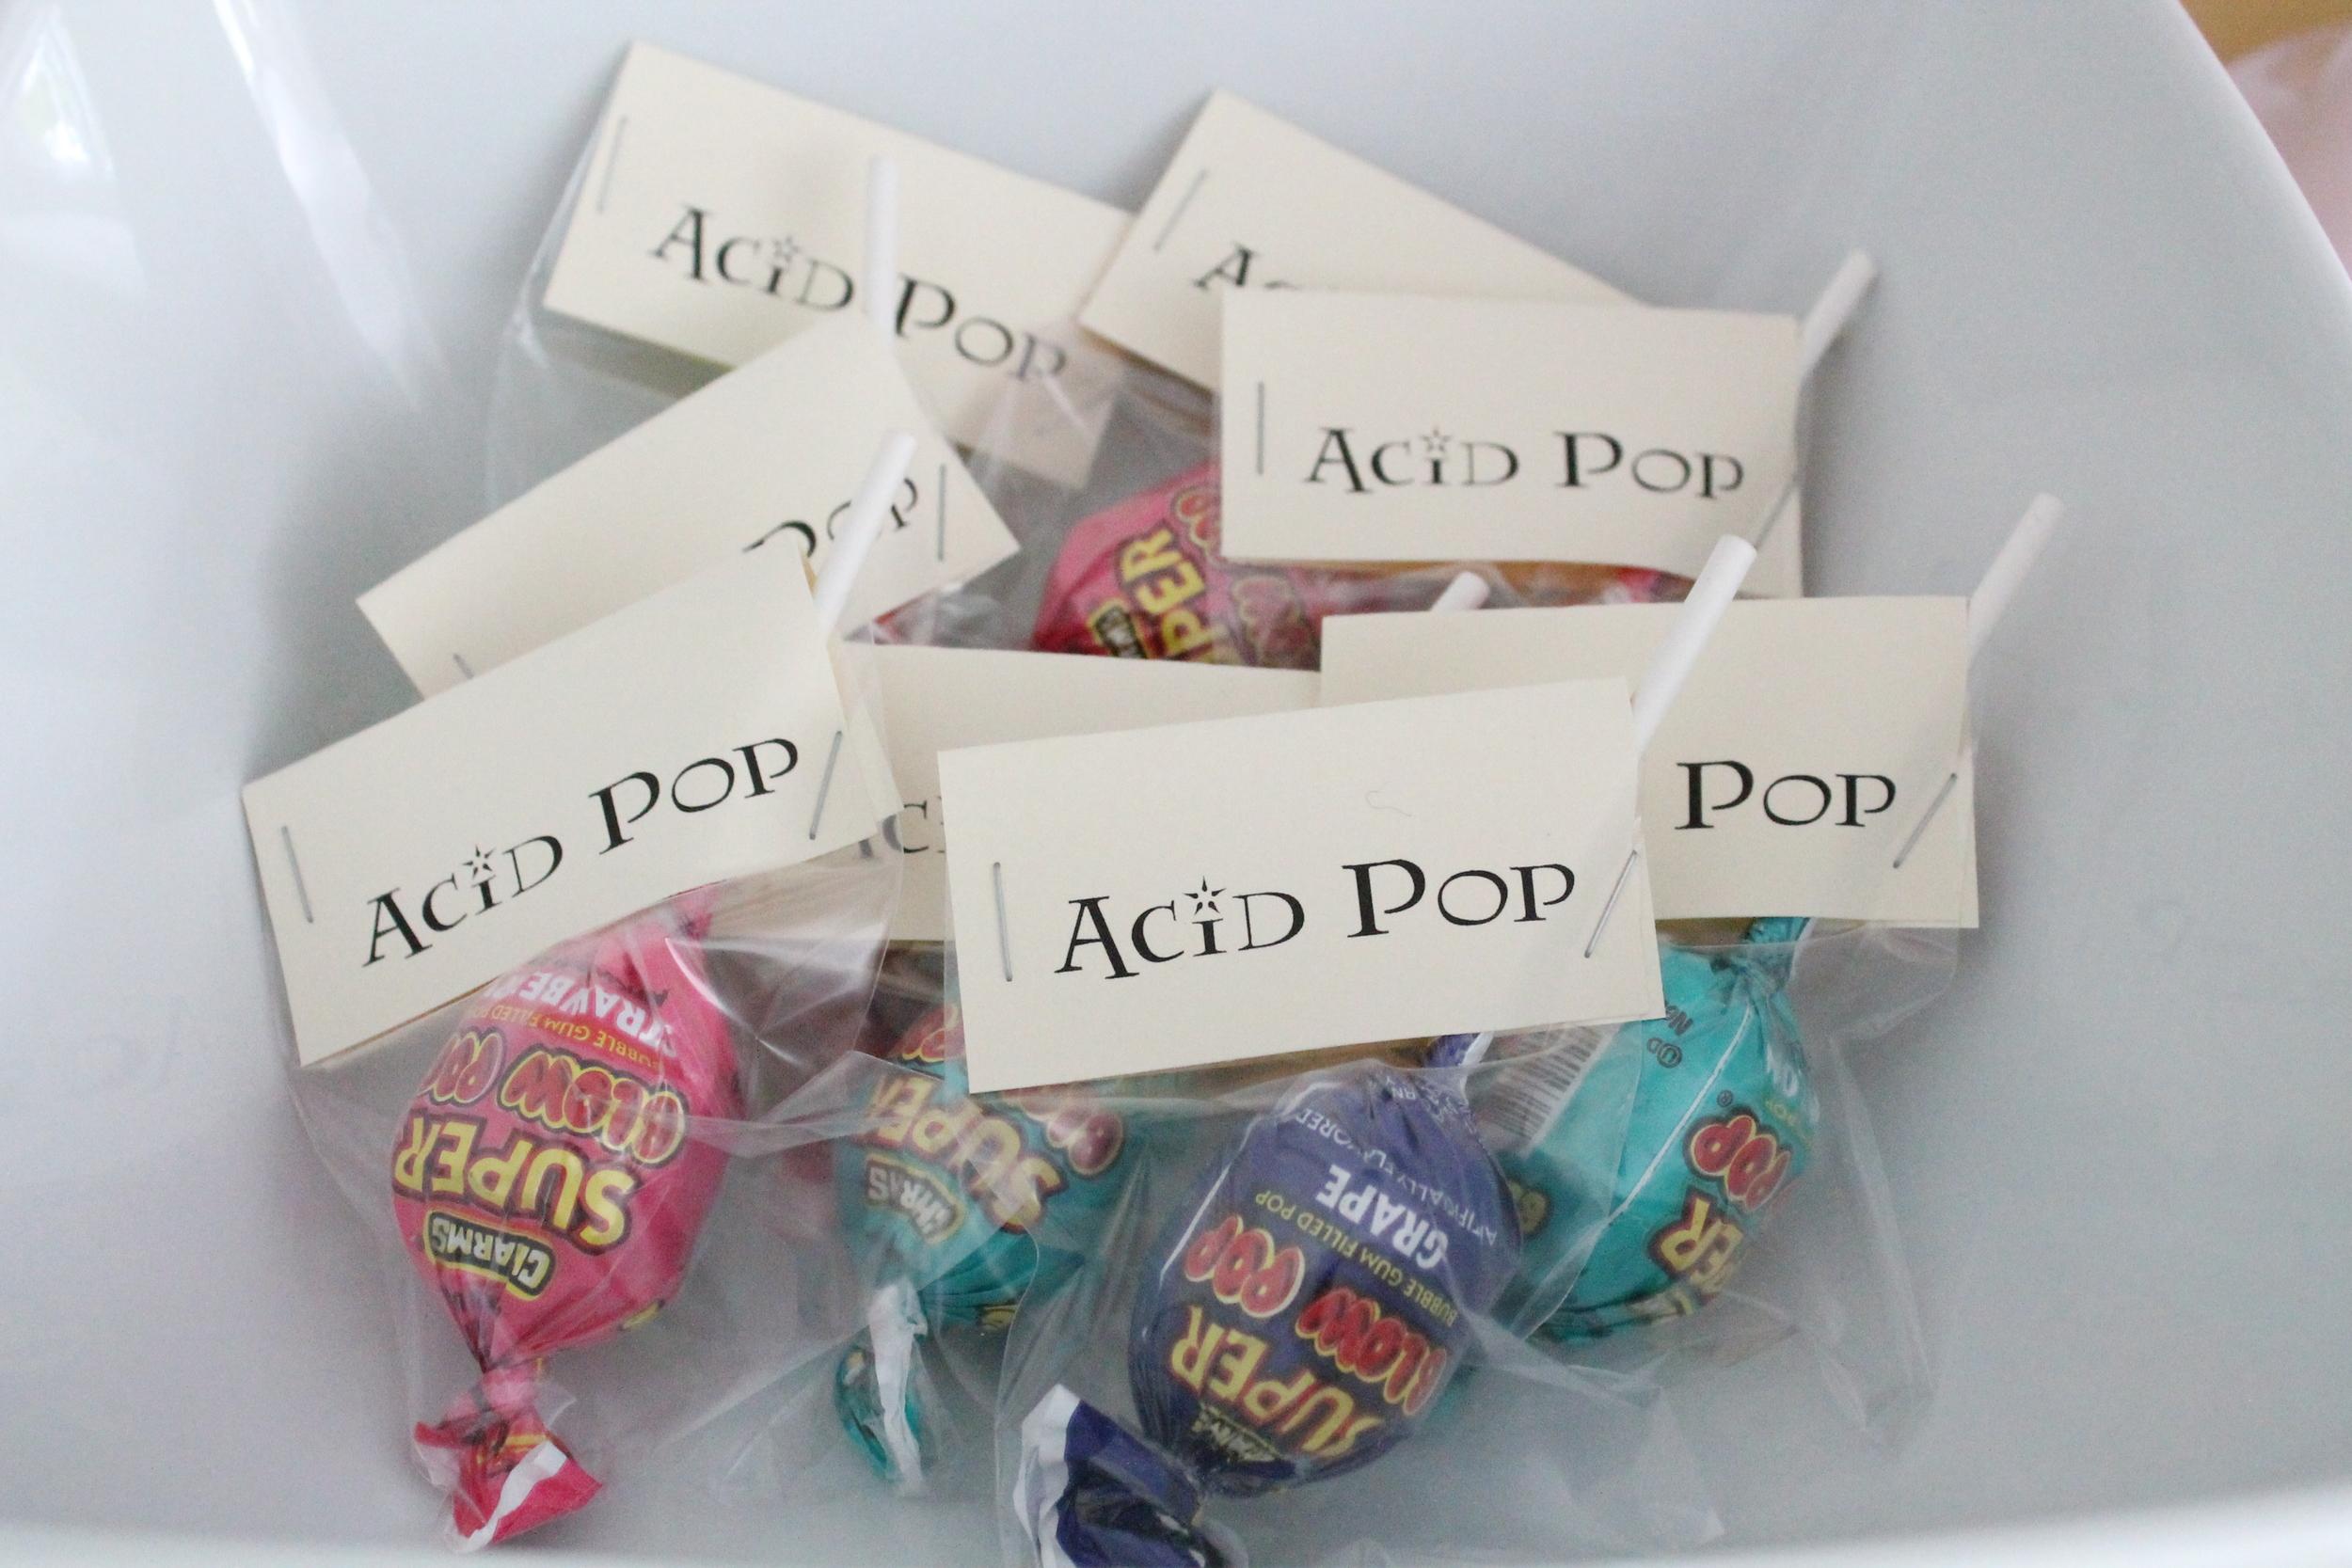 Harry Potter Candy- Acid Pops